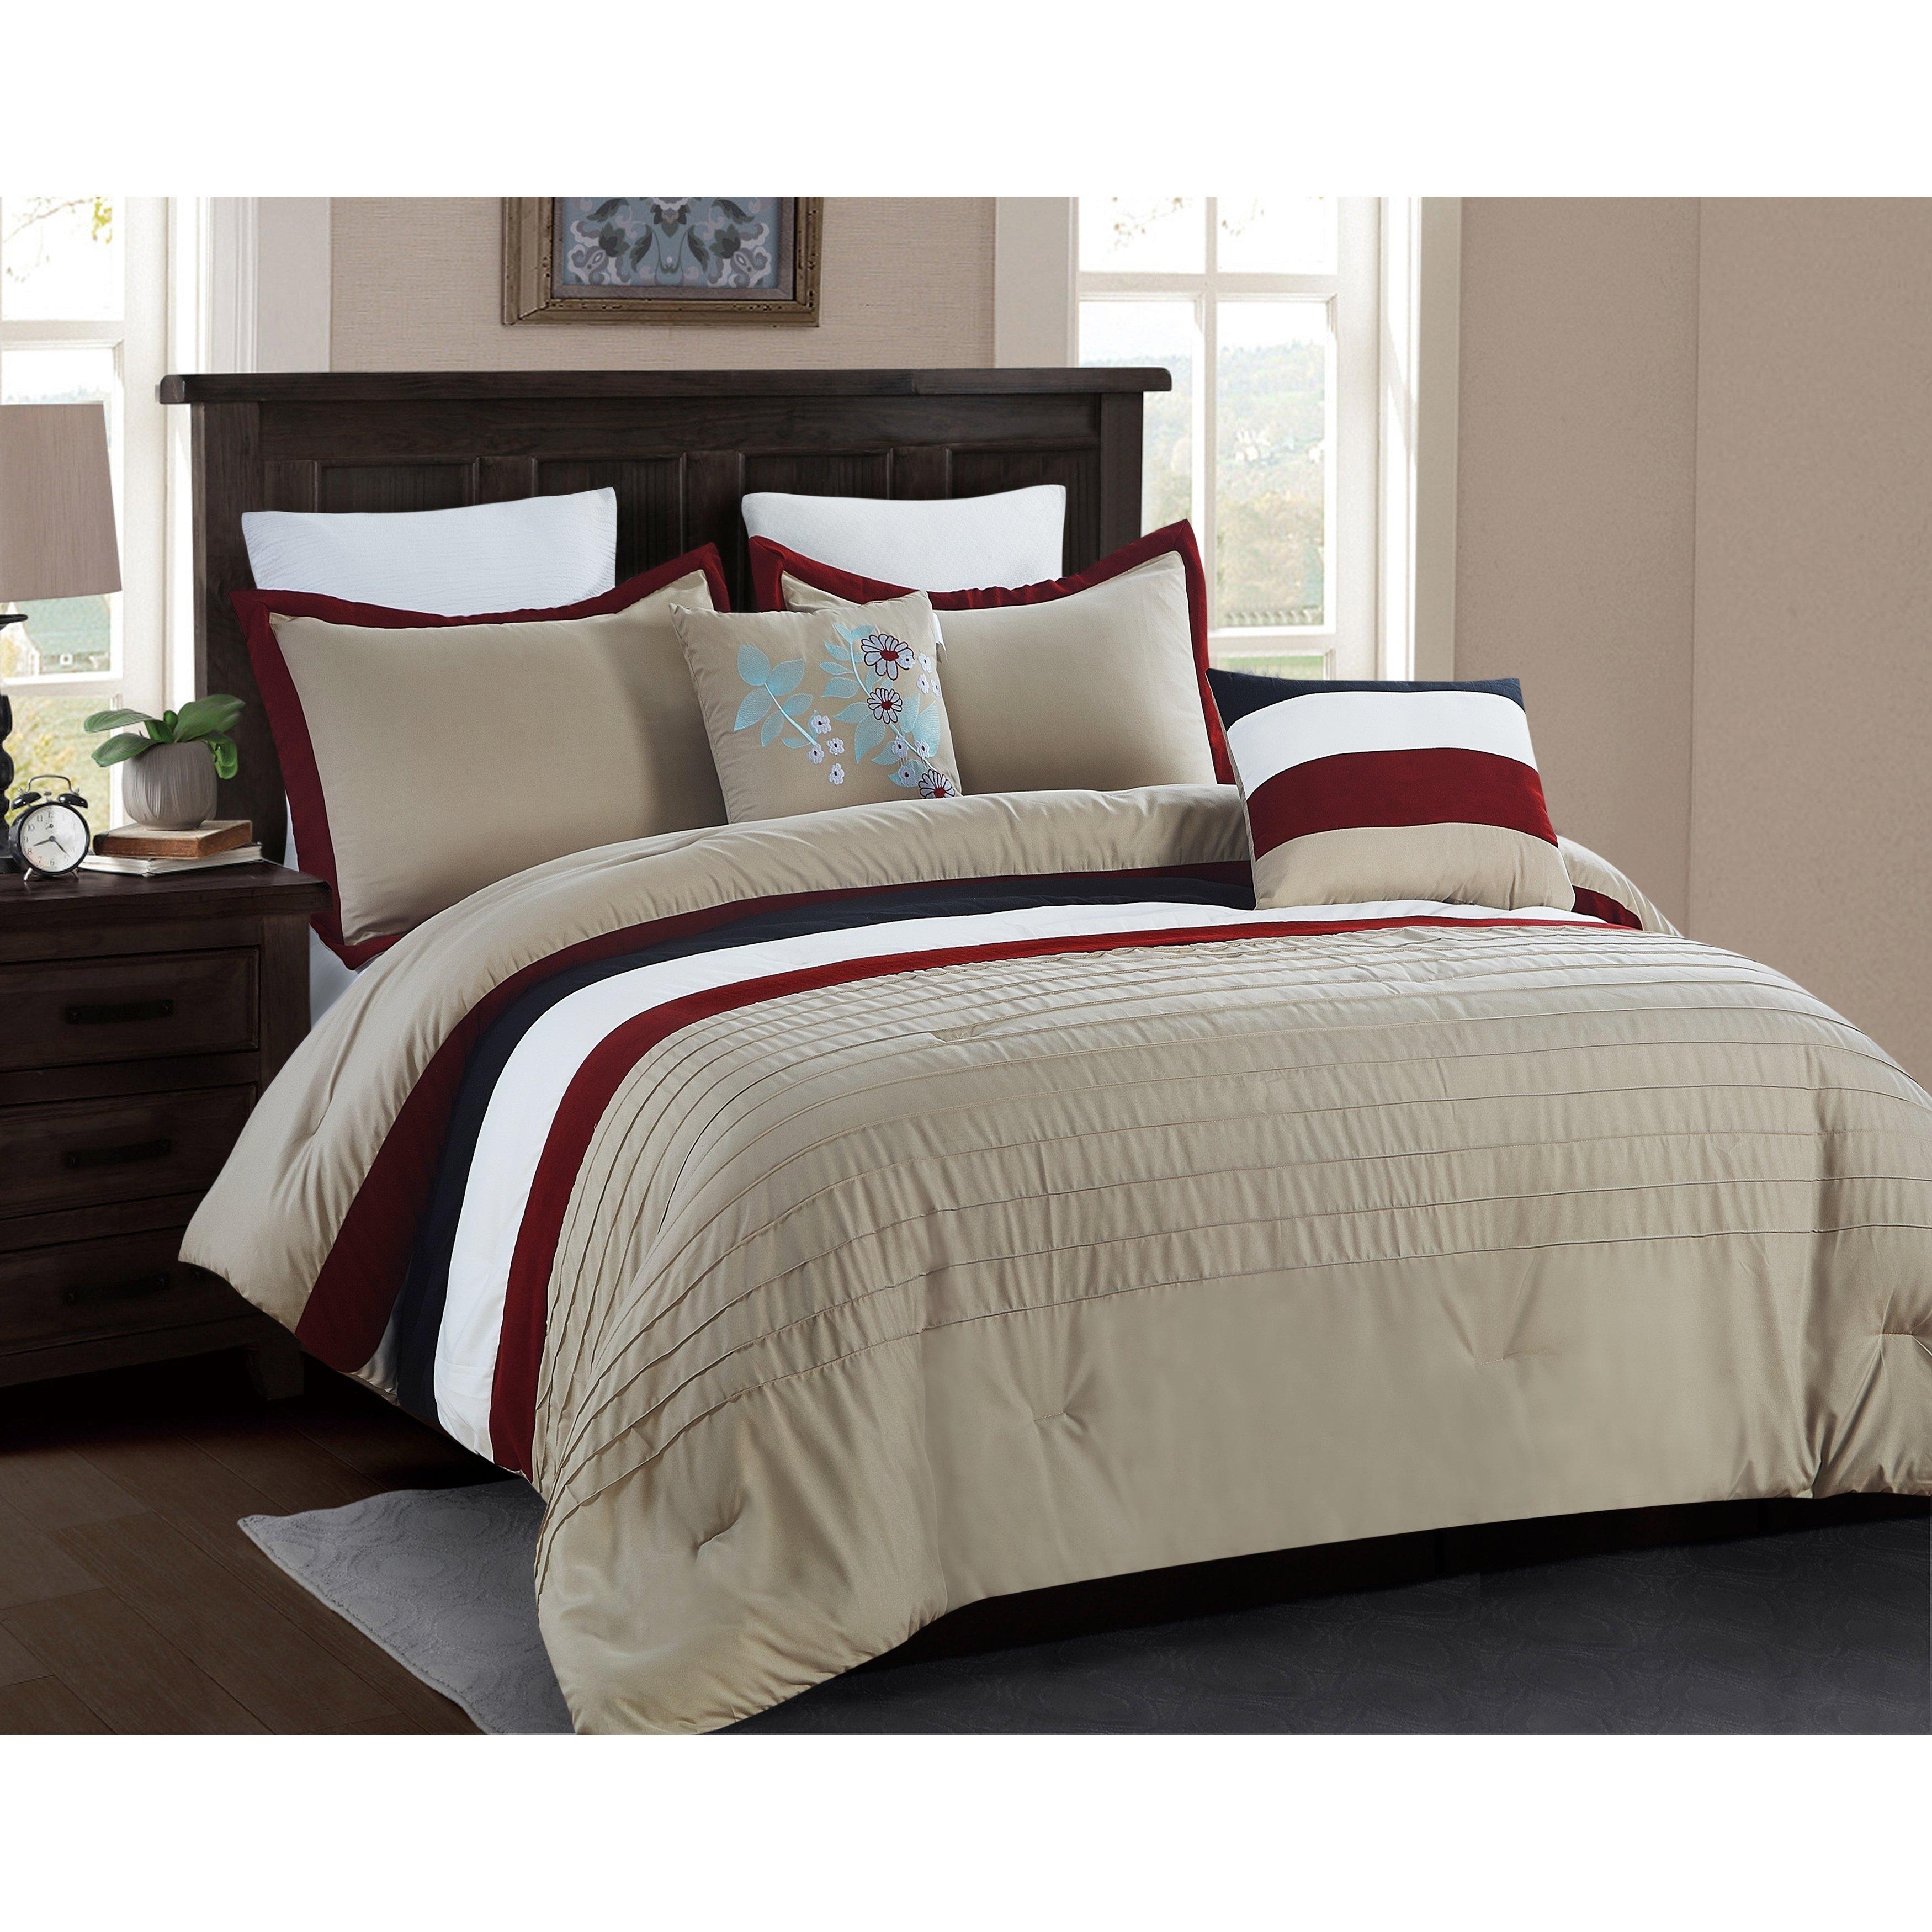 Amazon Com 4pc Black Microsuede Down Alternative Comforter Set